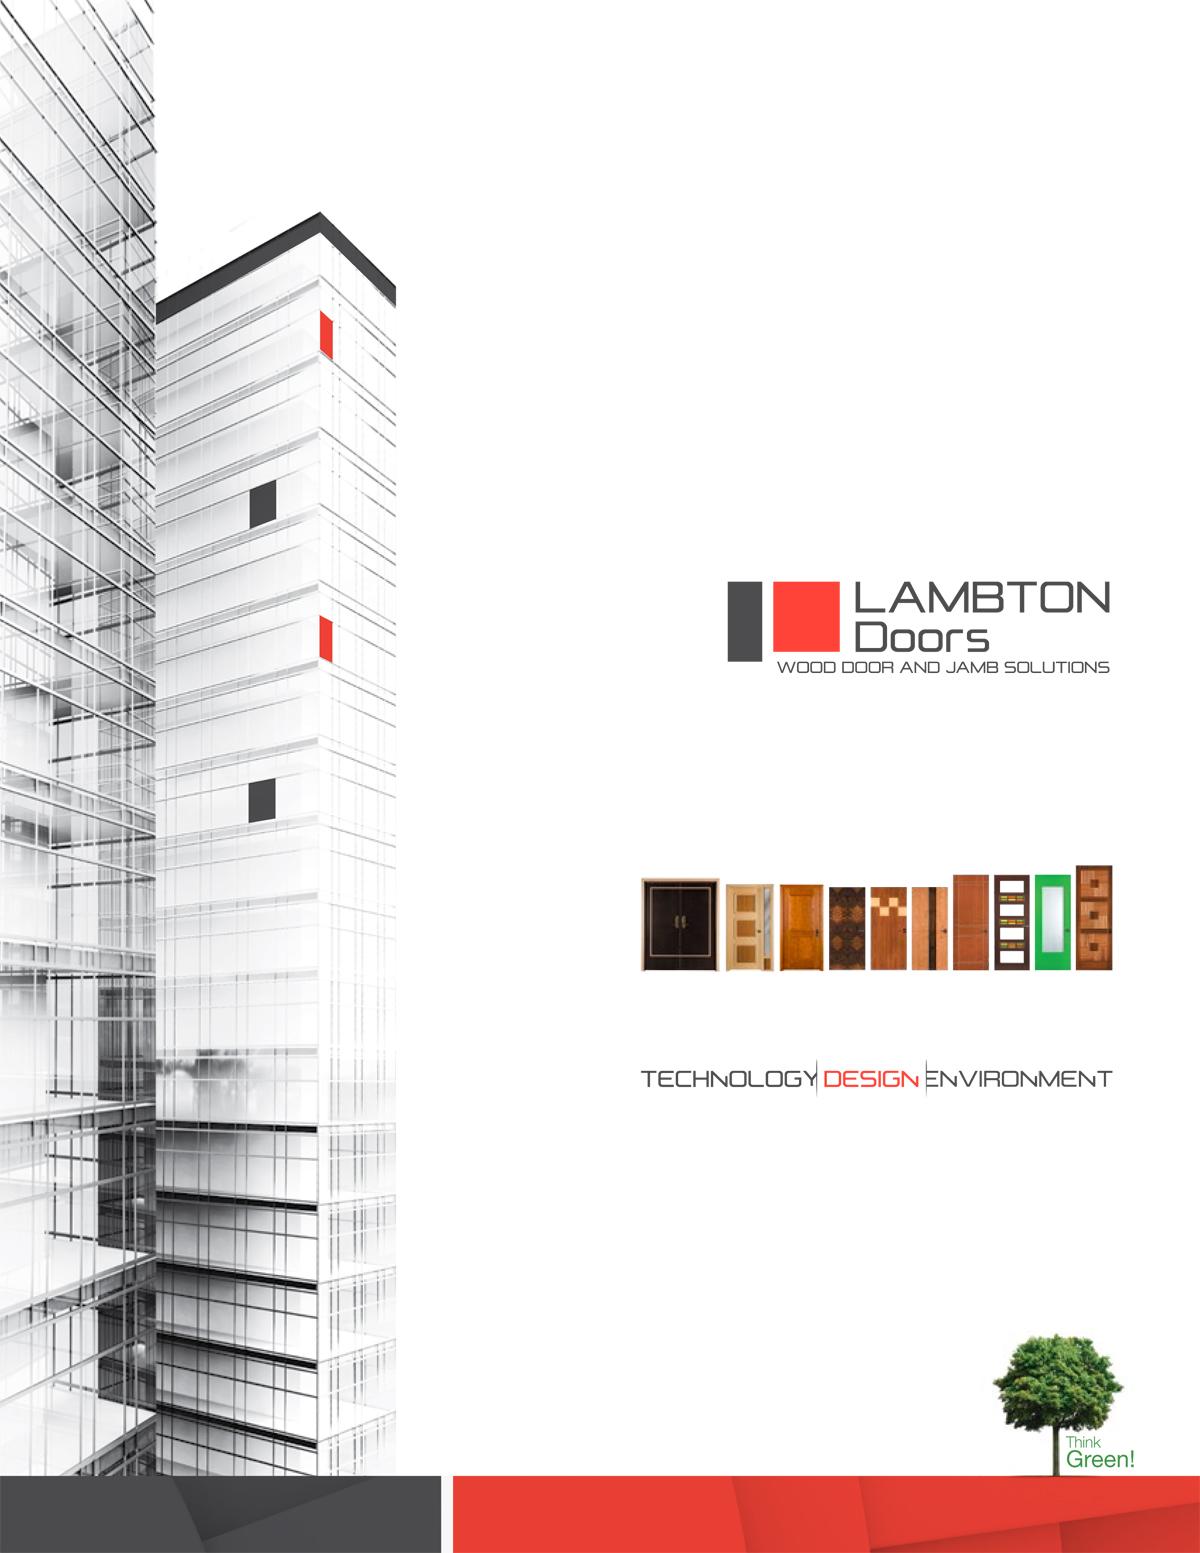 LAMBTON_DOORS_Cover_Design_2016